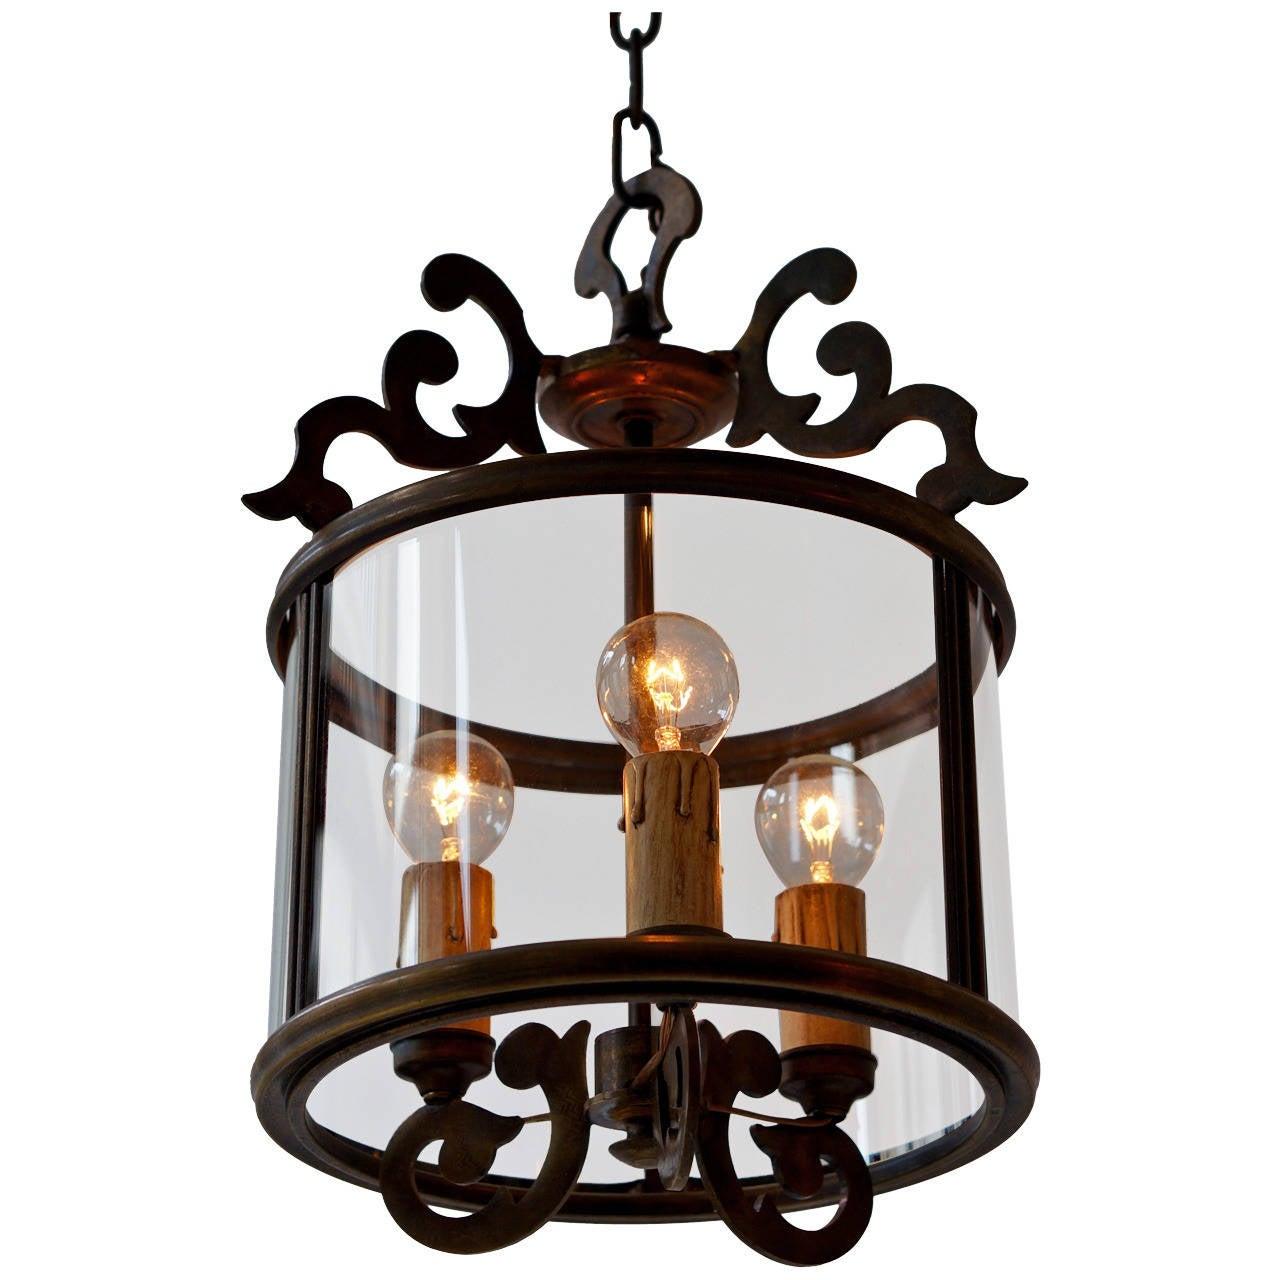 Three Italian Brass Hall Lantern Pendant Lights By Sciolari For Sale